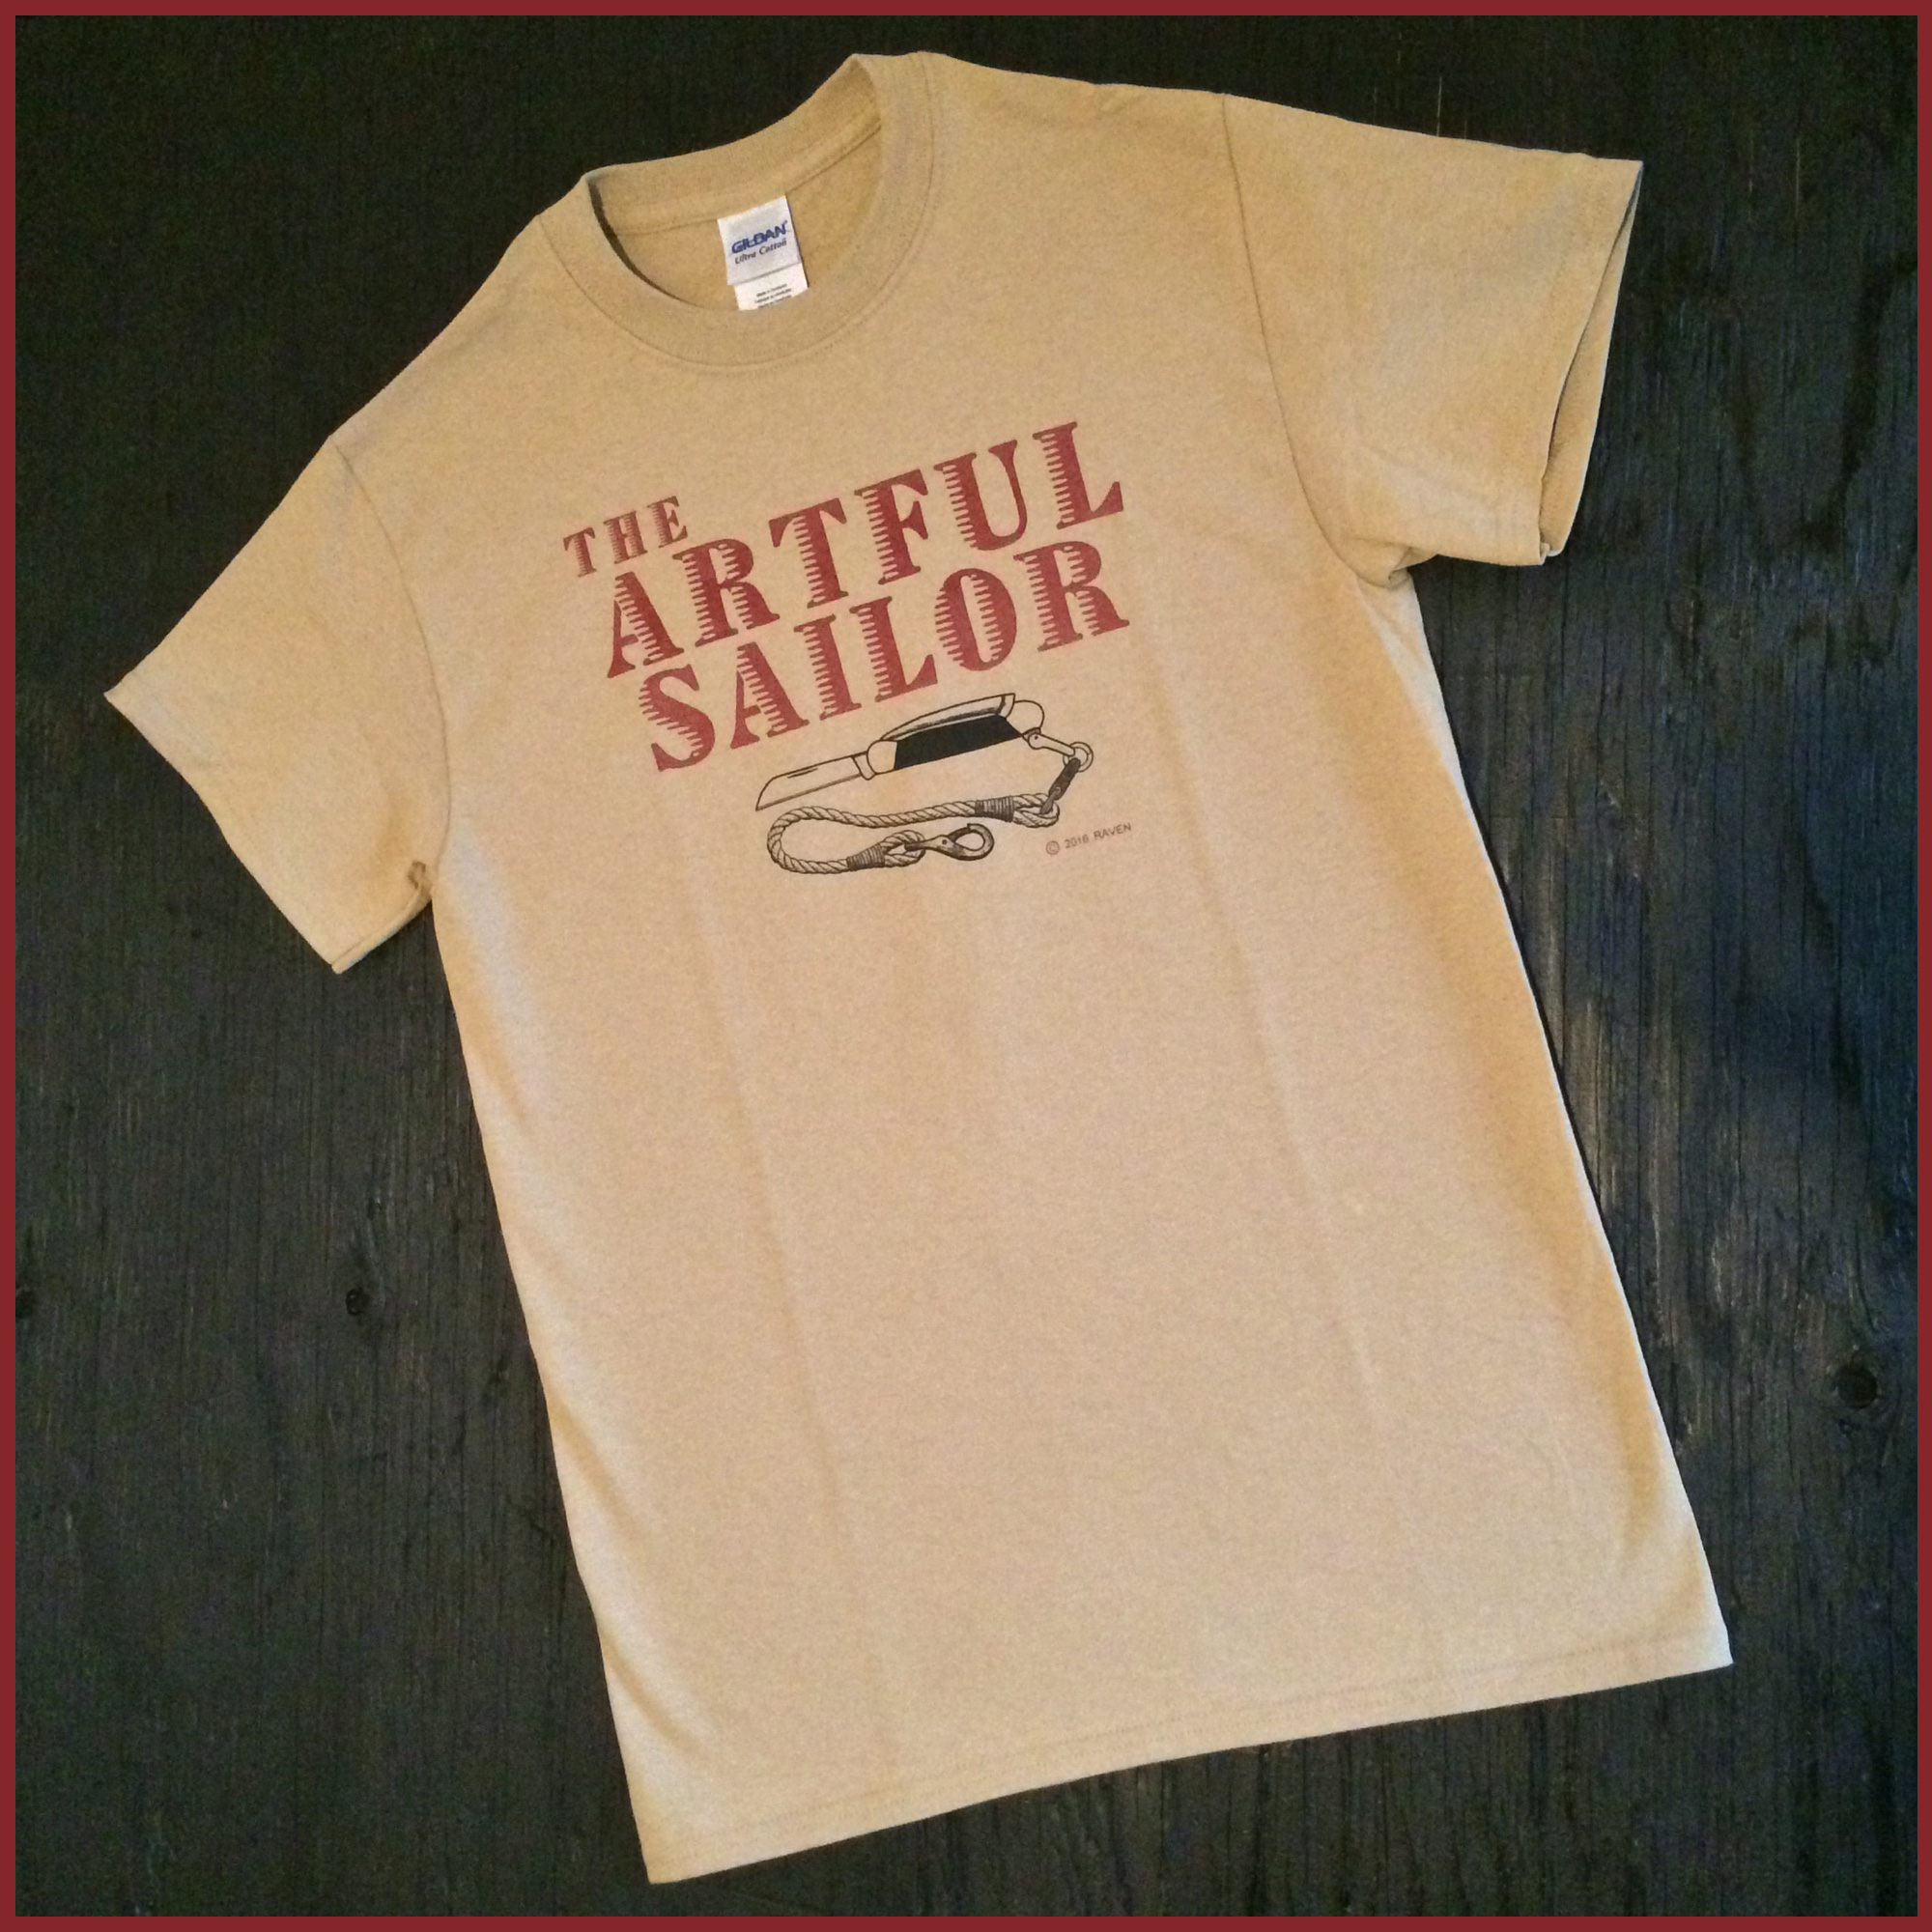 T-shirt2color.jpg